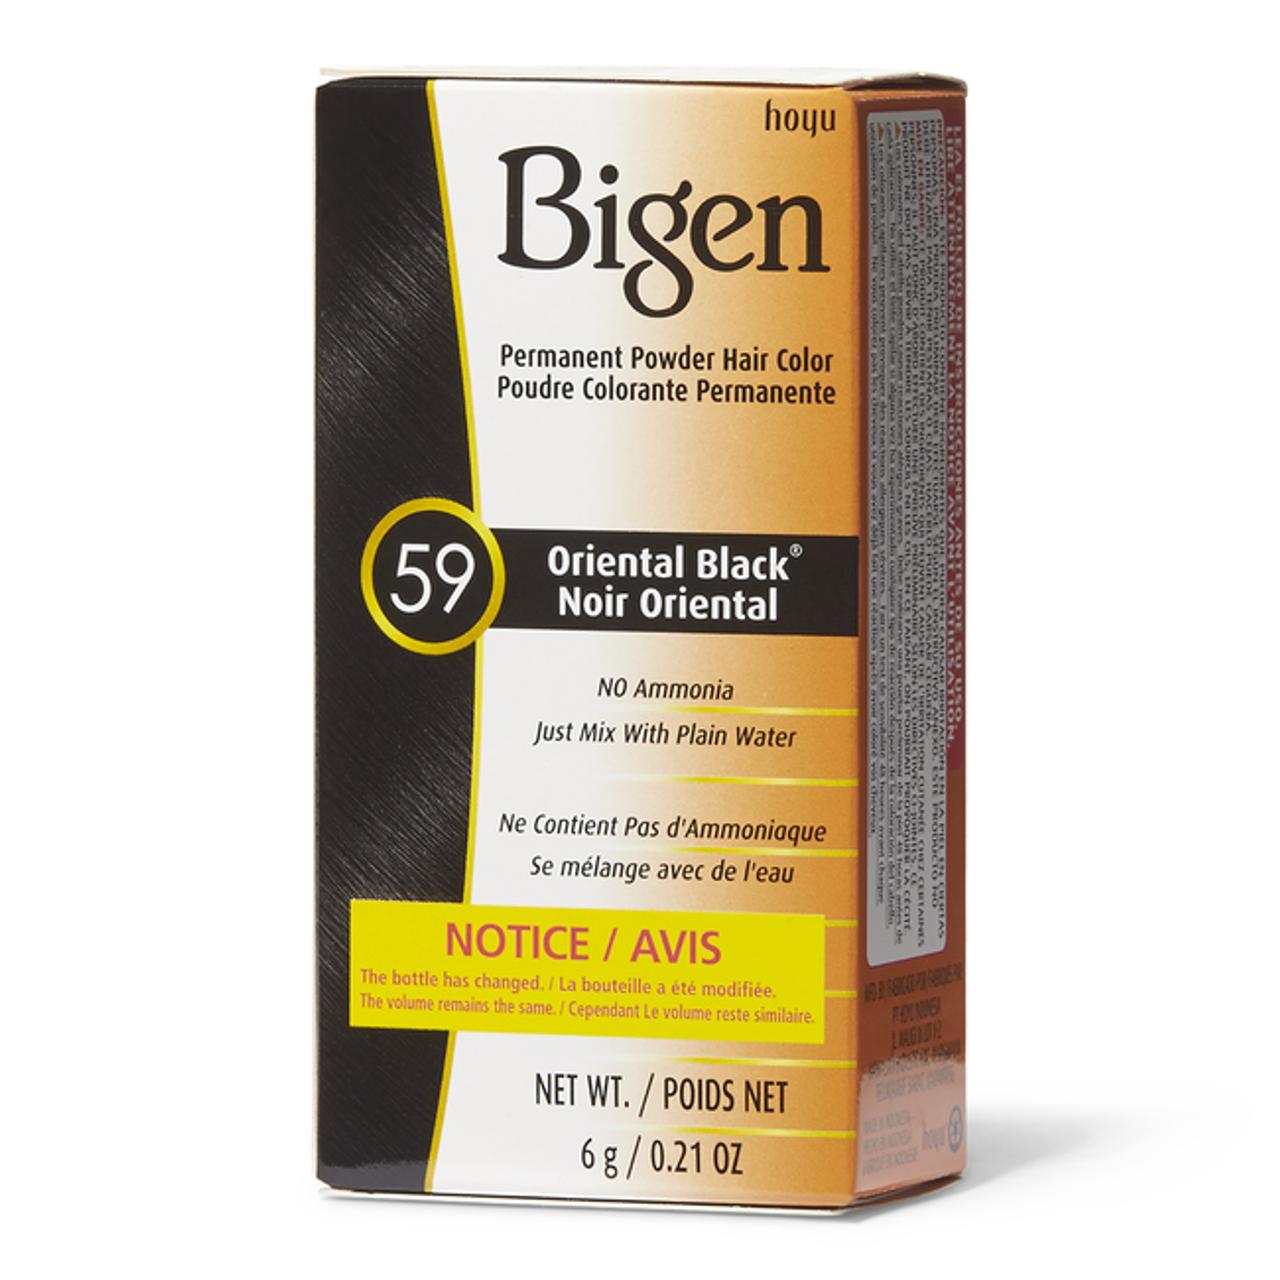 Bigen Oriental Black 59 0.21 oz box